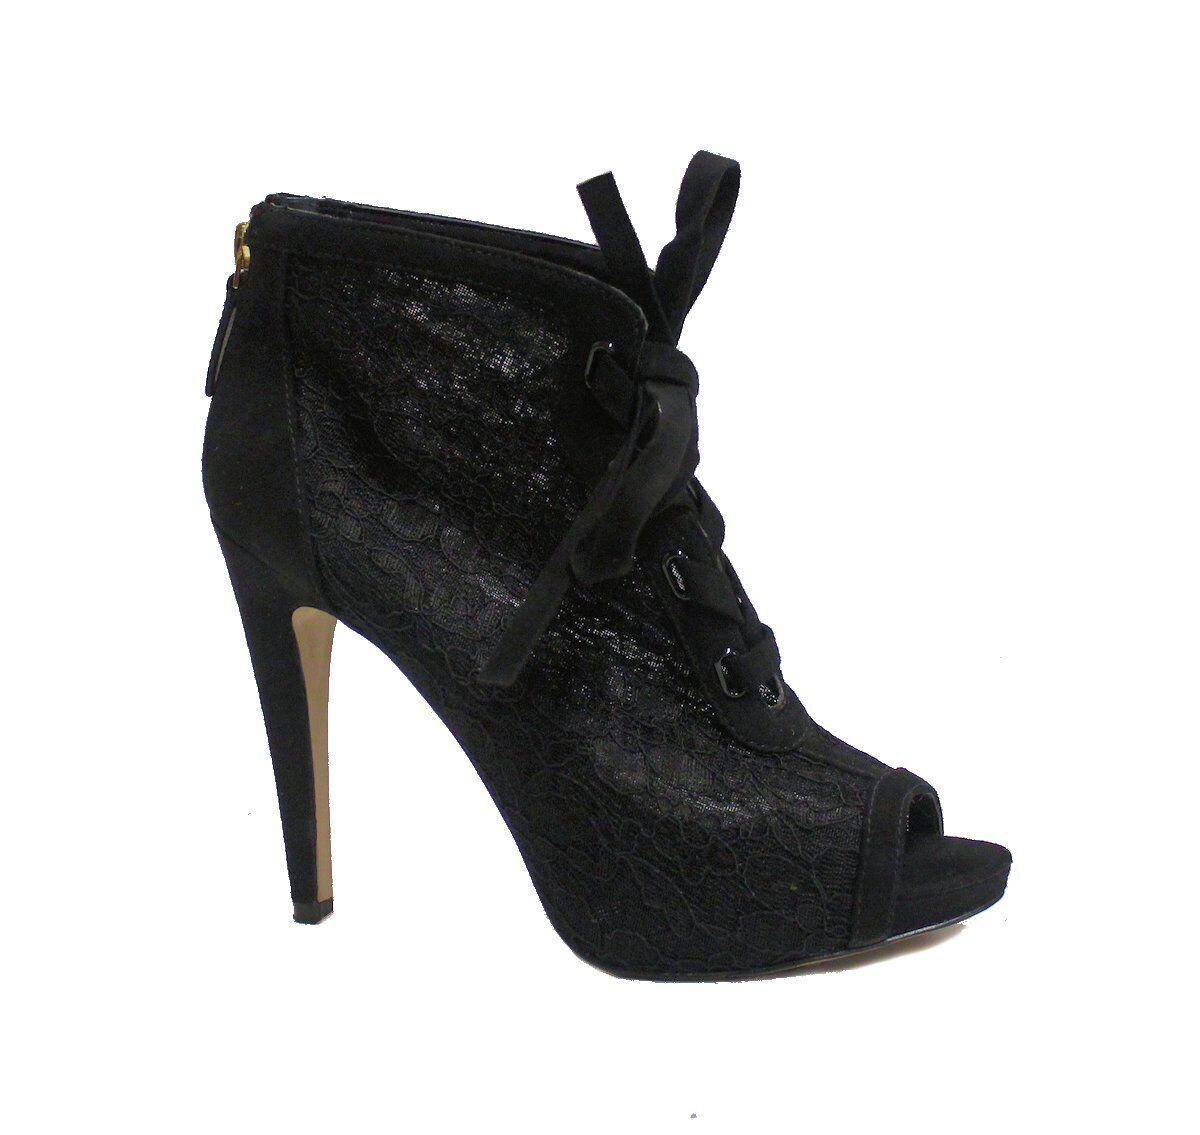 Nine West Women's Lace Up Heels Black US 8.5 NWD